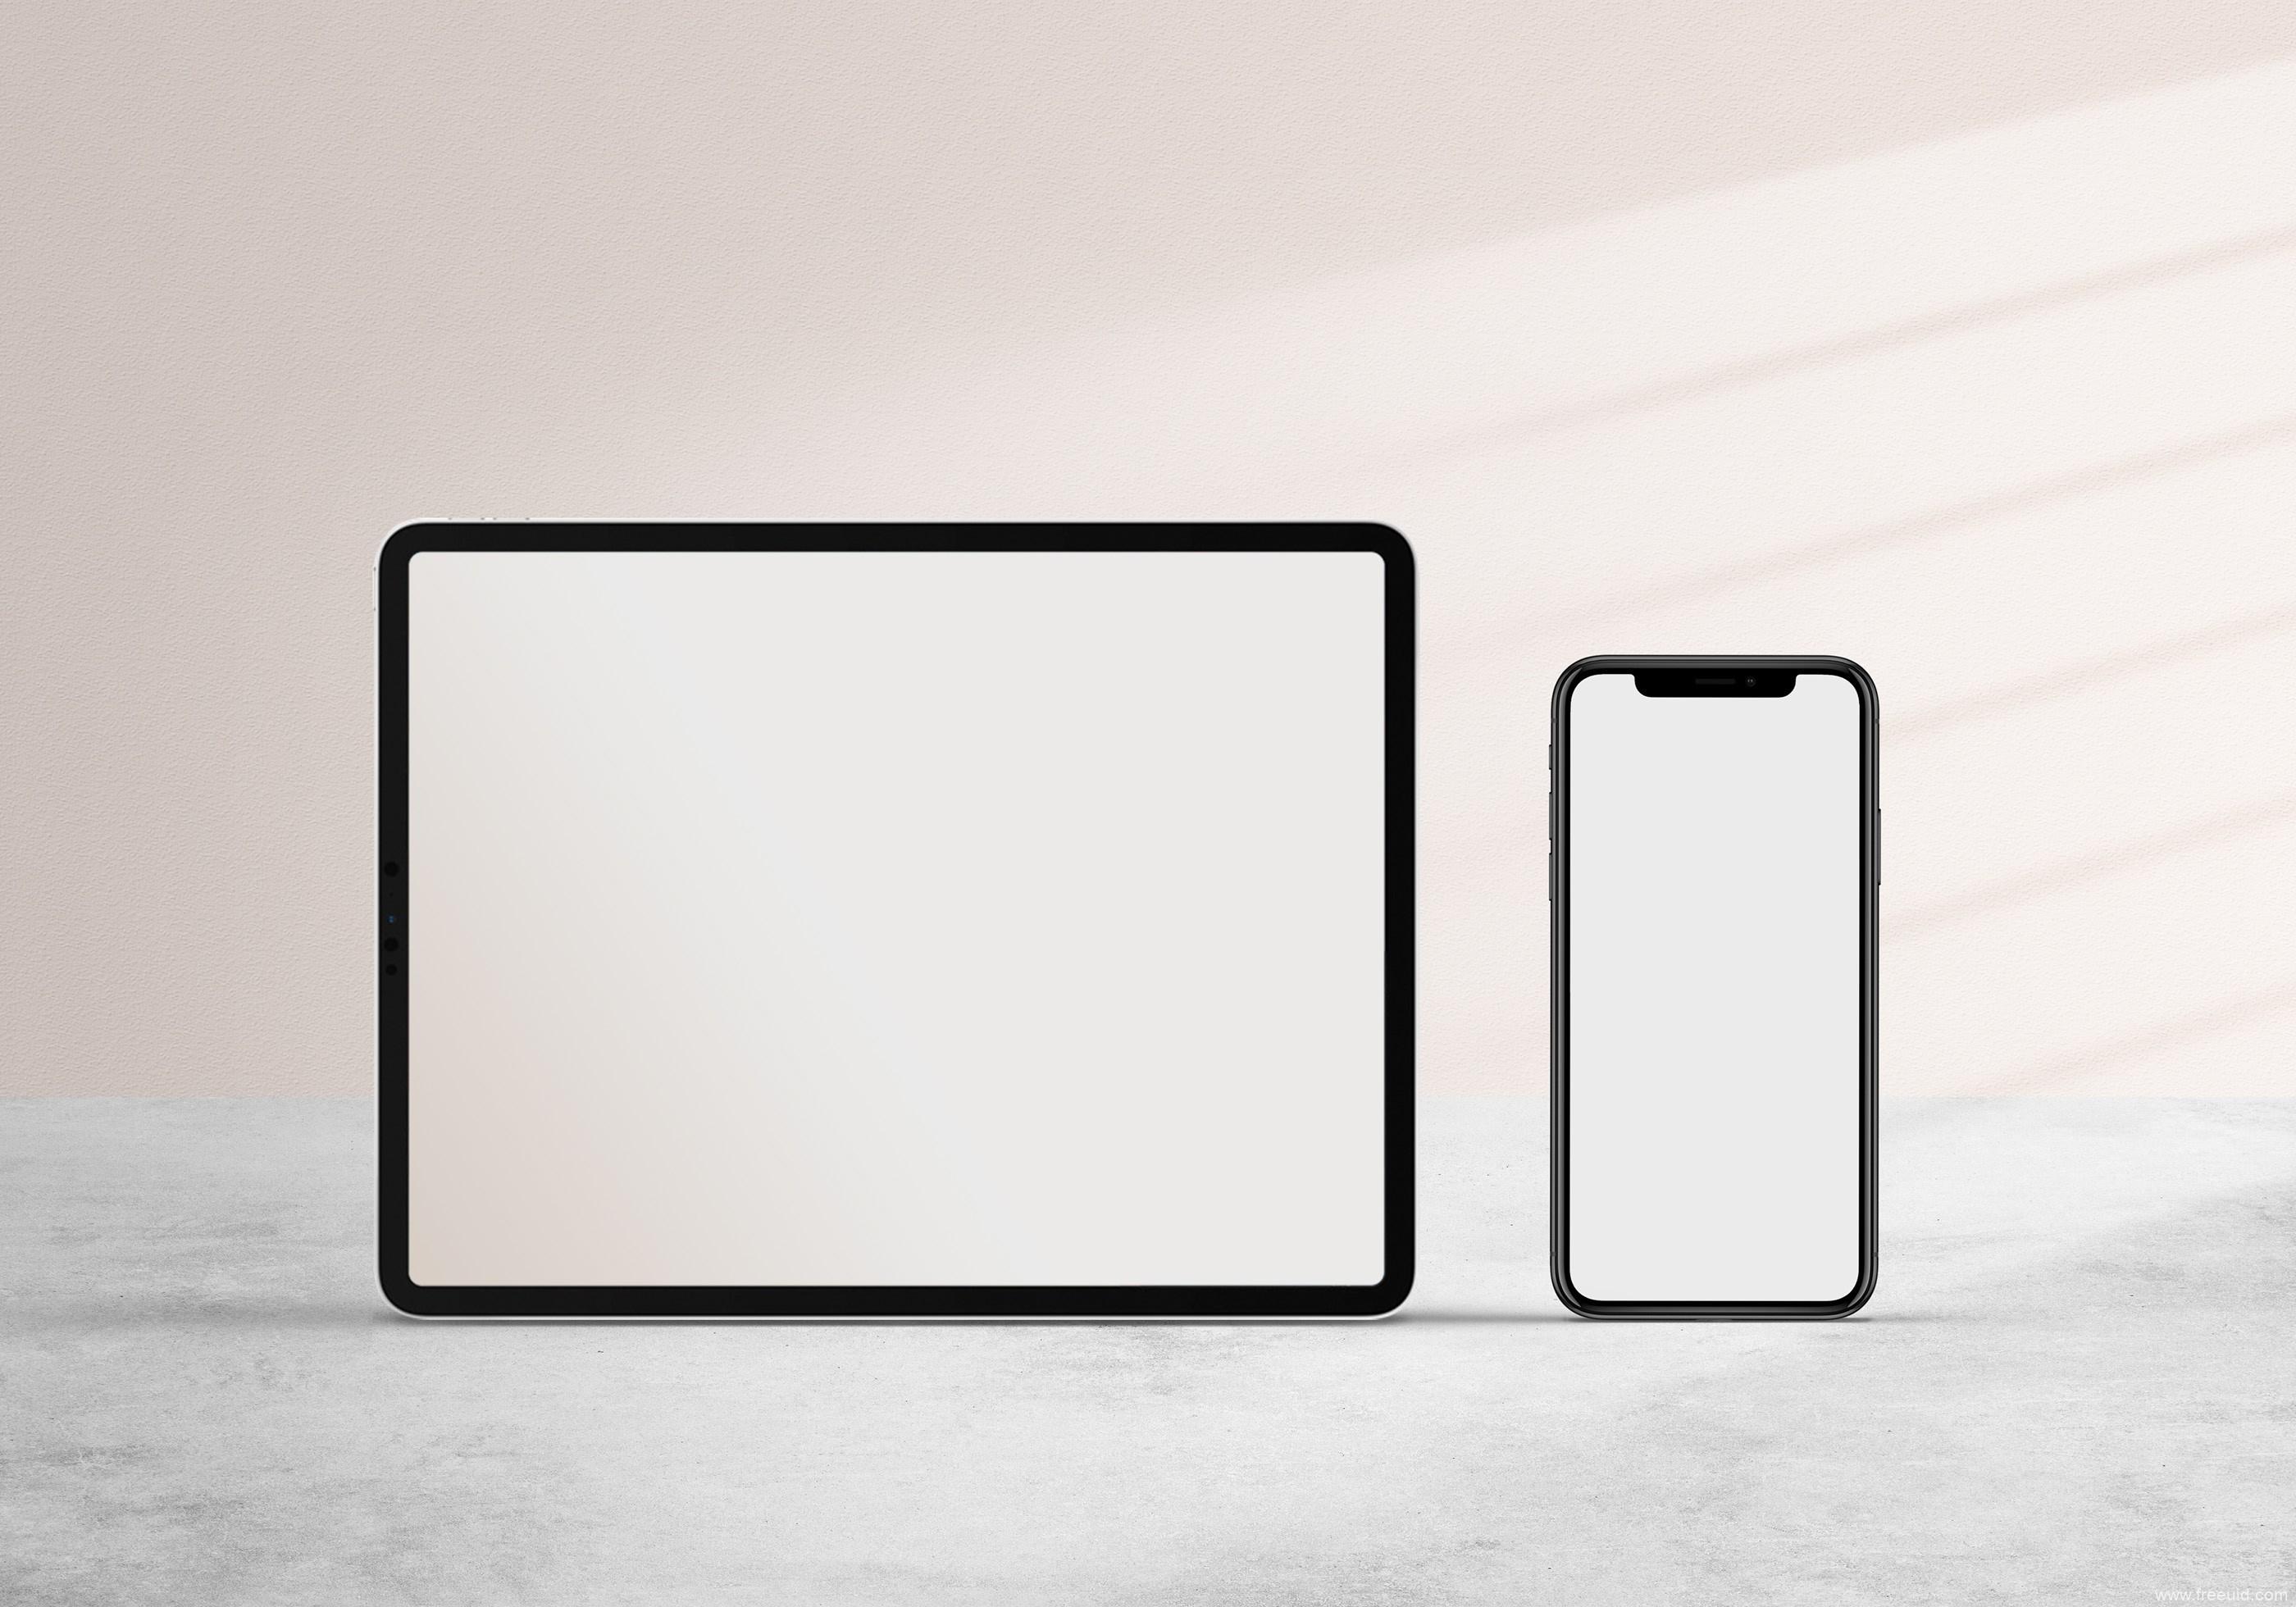 iPad pro样机,iPhone 11样机,iPad pro mockup,iPhone 11 mockup psd源文件